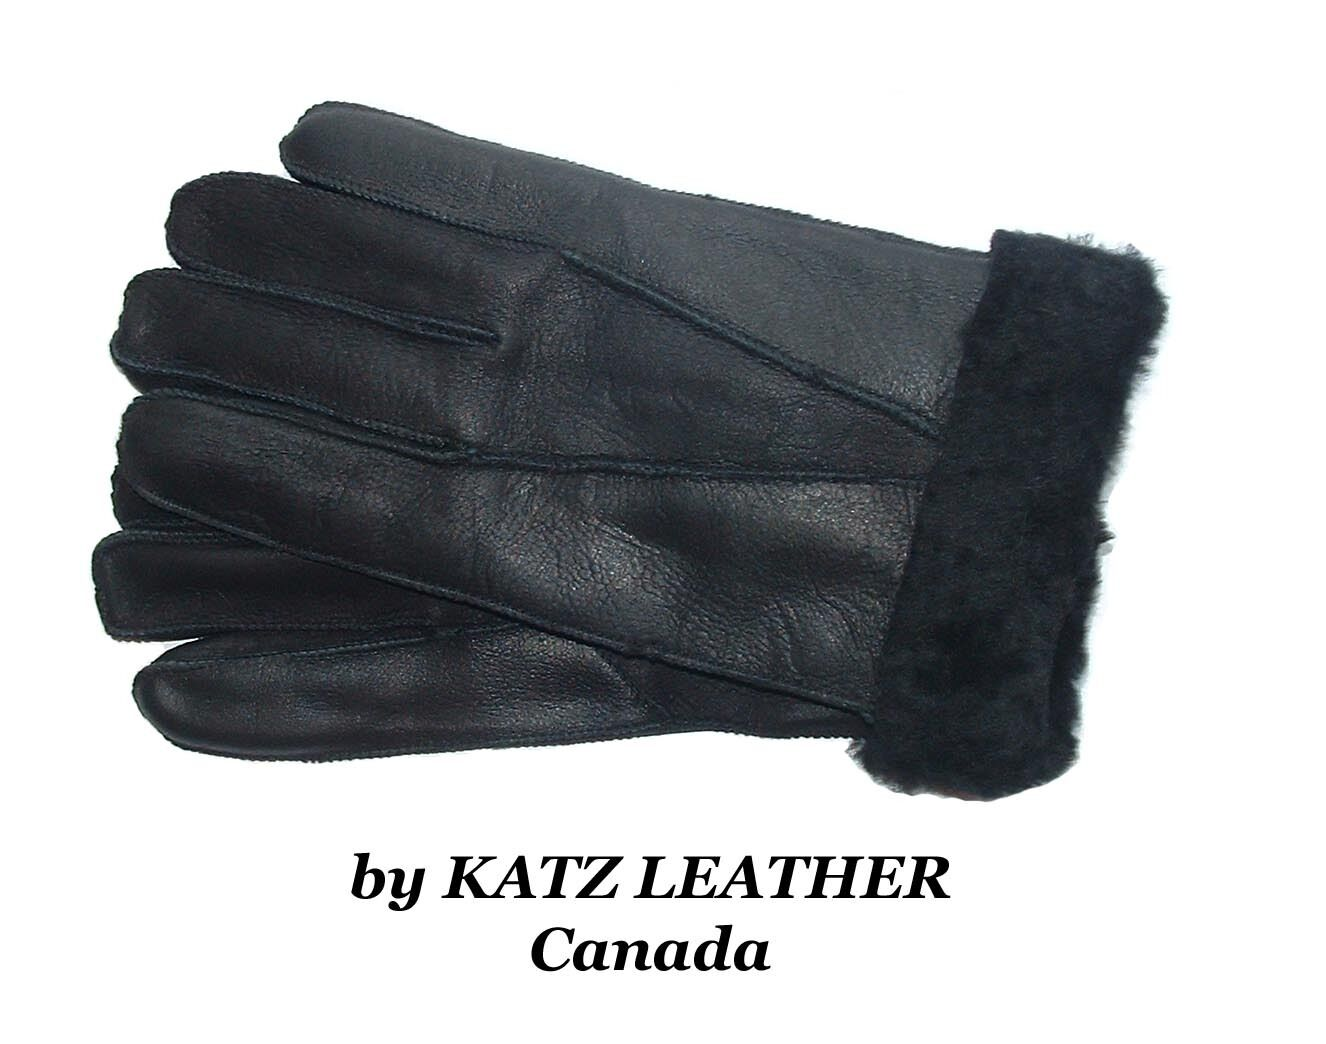 Black 100% Sheepskin Shearling Leather Men's Gloves Warm Winter choose S M L